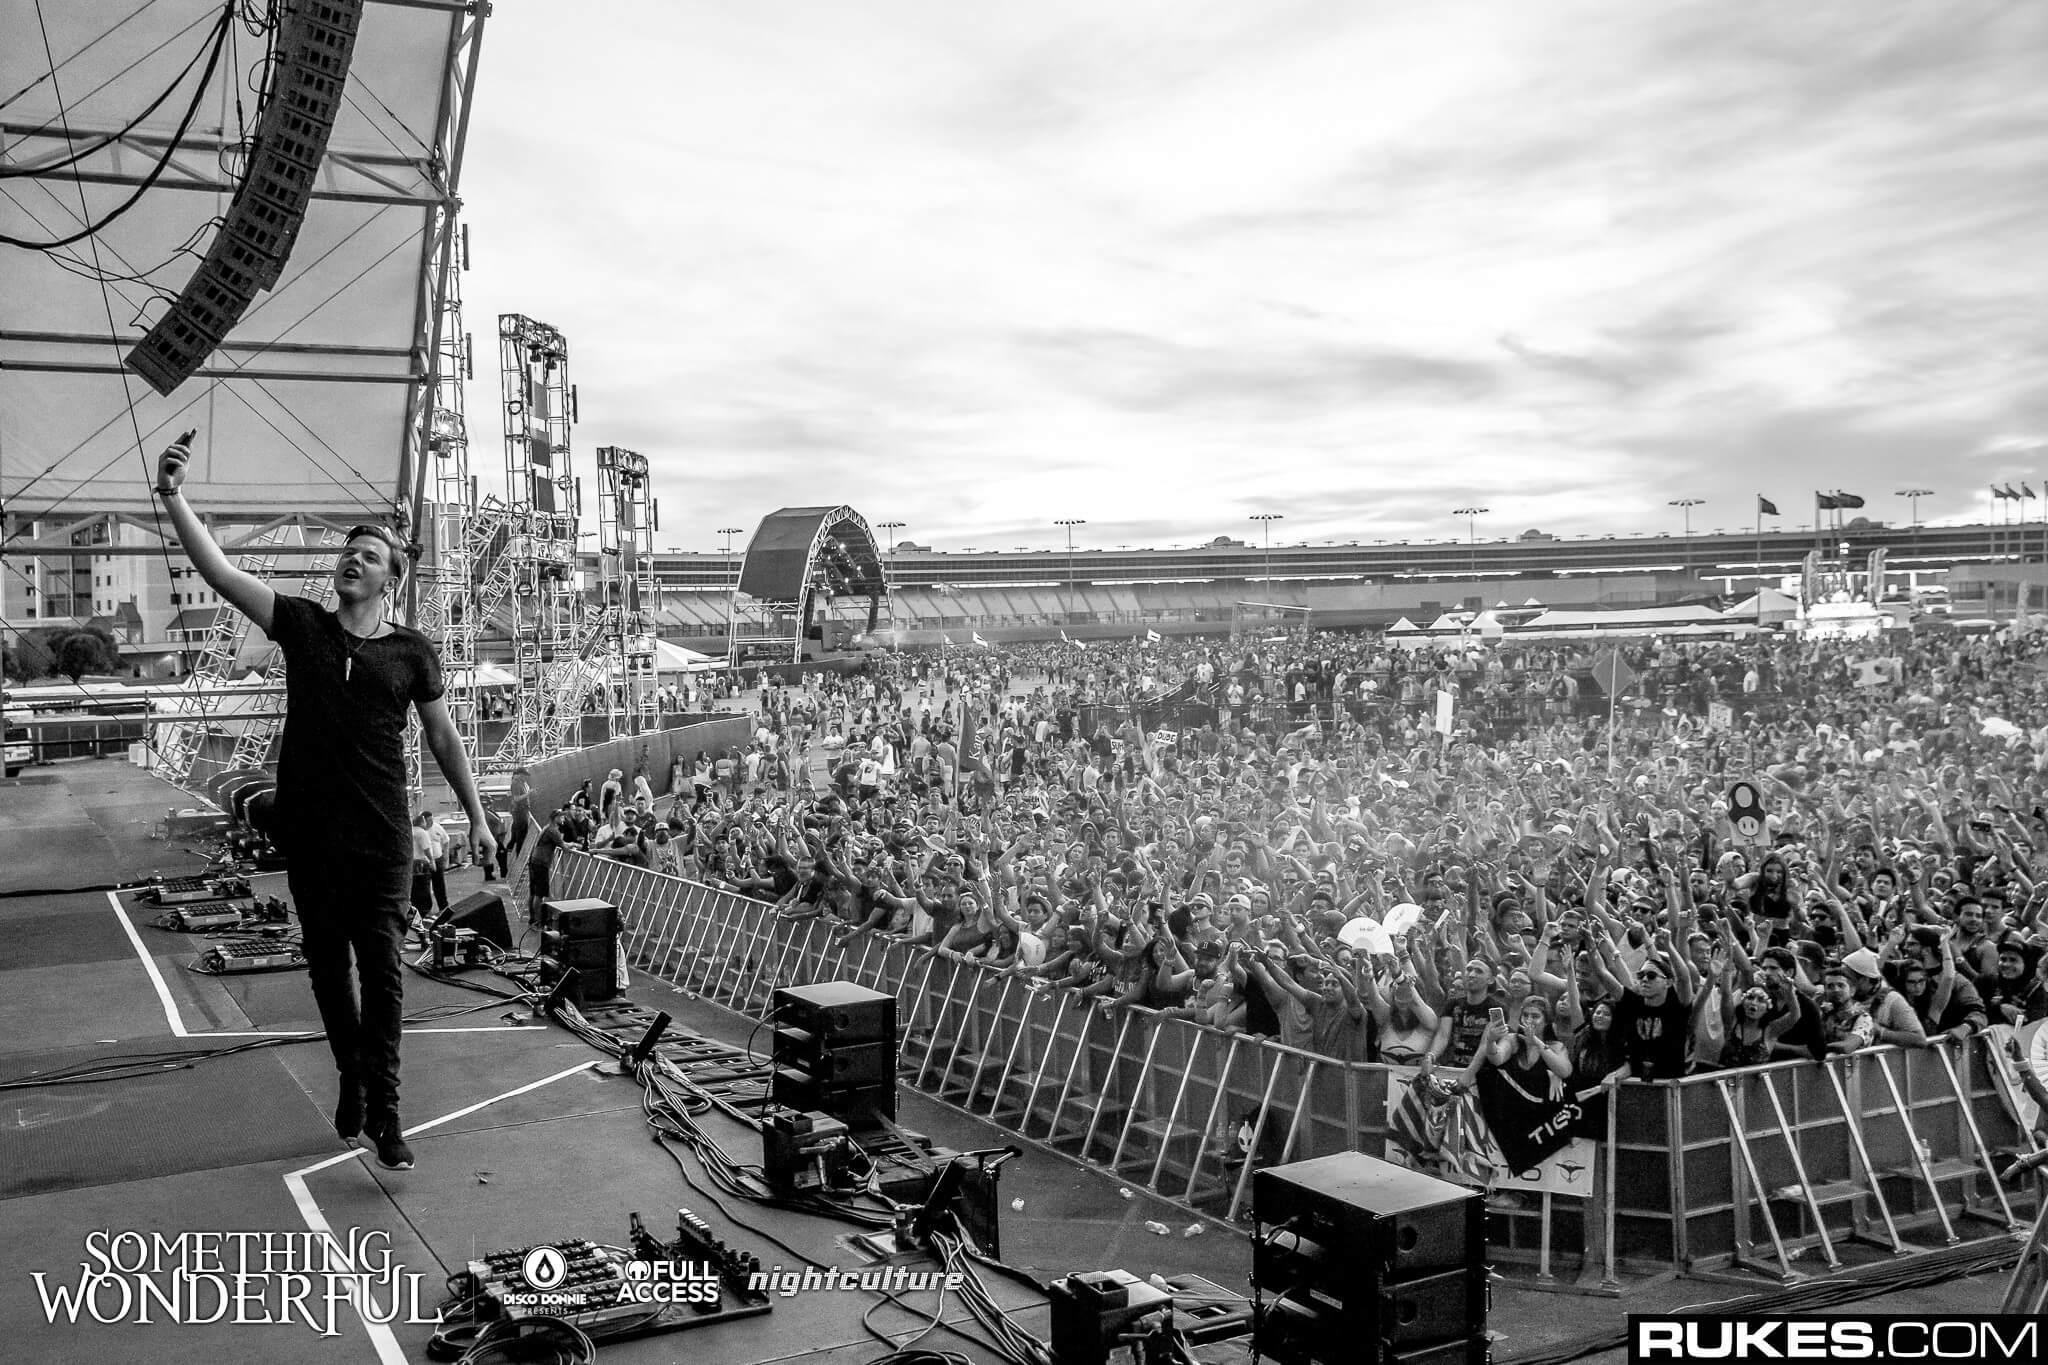 sam feldt taking a selfie on stage at something wonderful festival